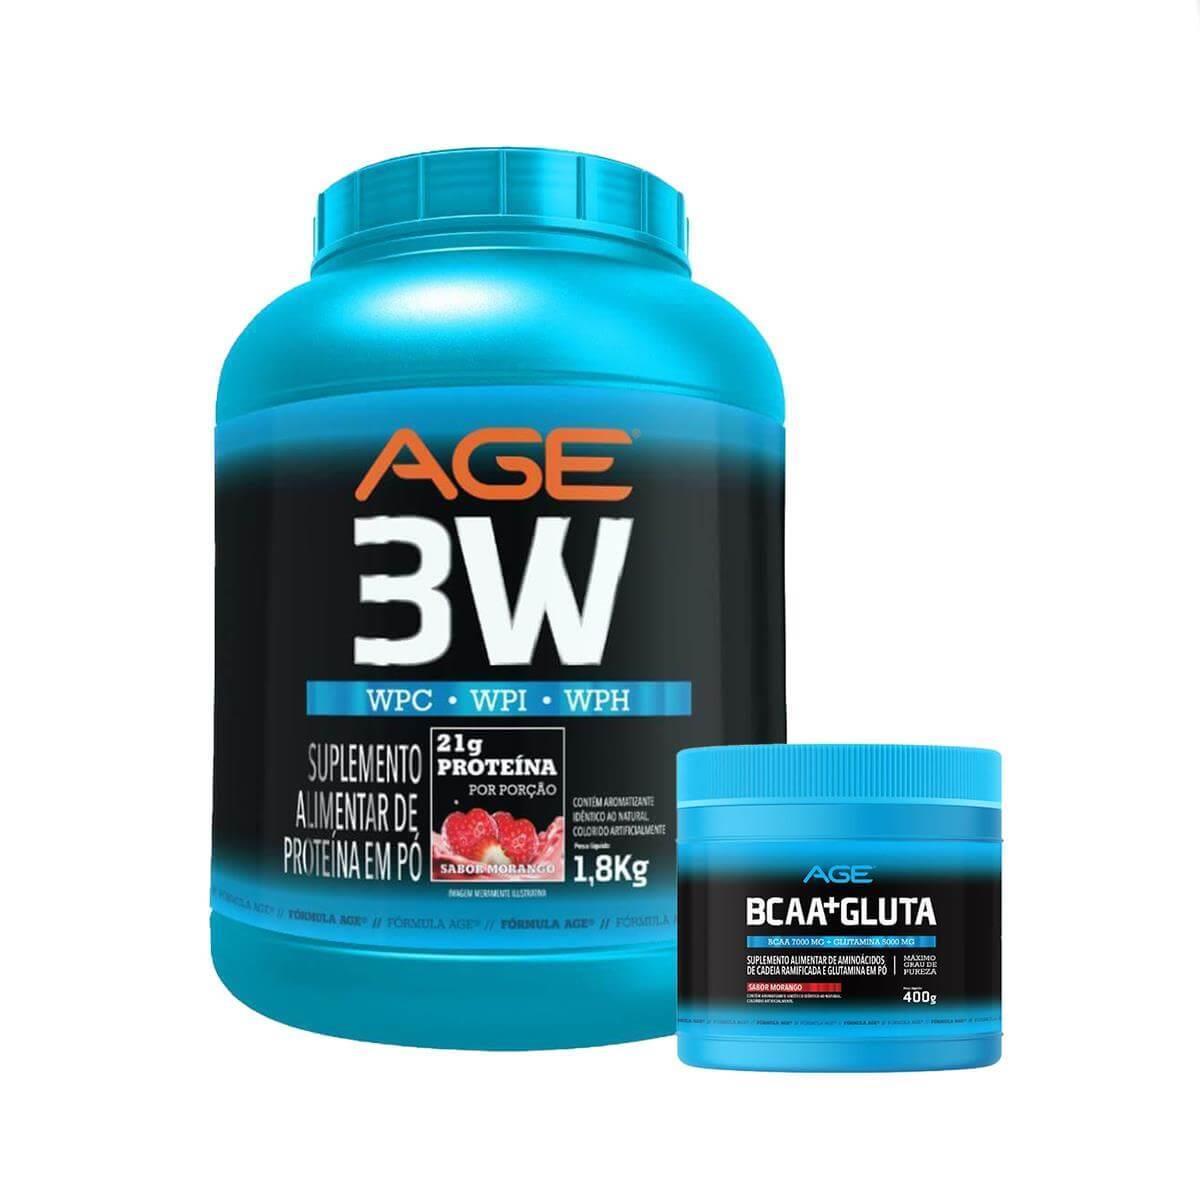 Whey 3W + BCAA e Glutamina (1,8Kg) - Morango - AGE